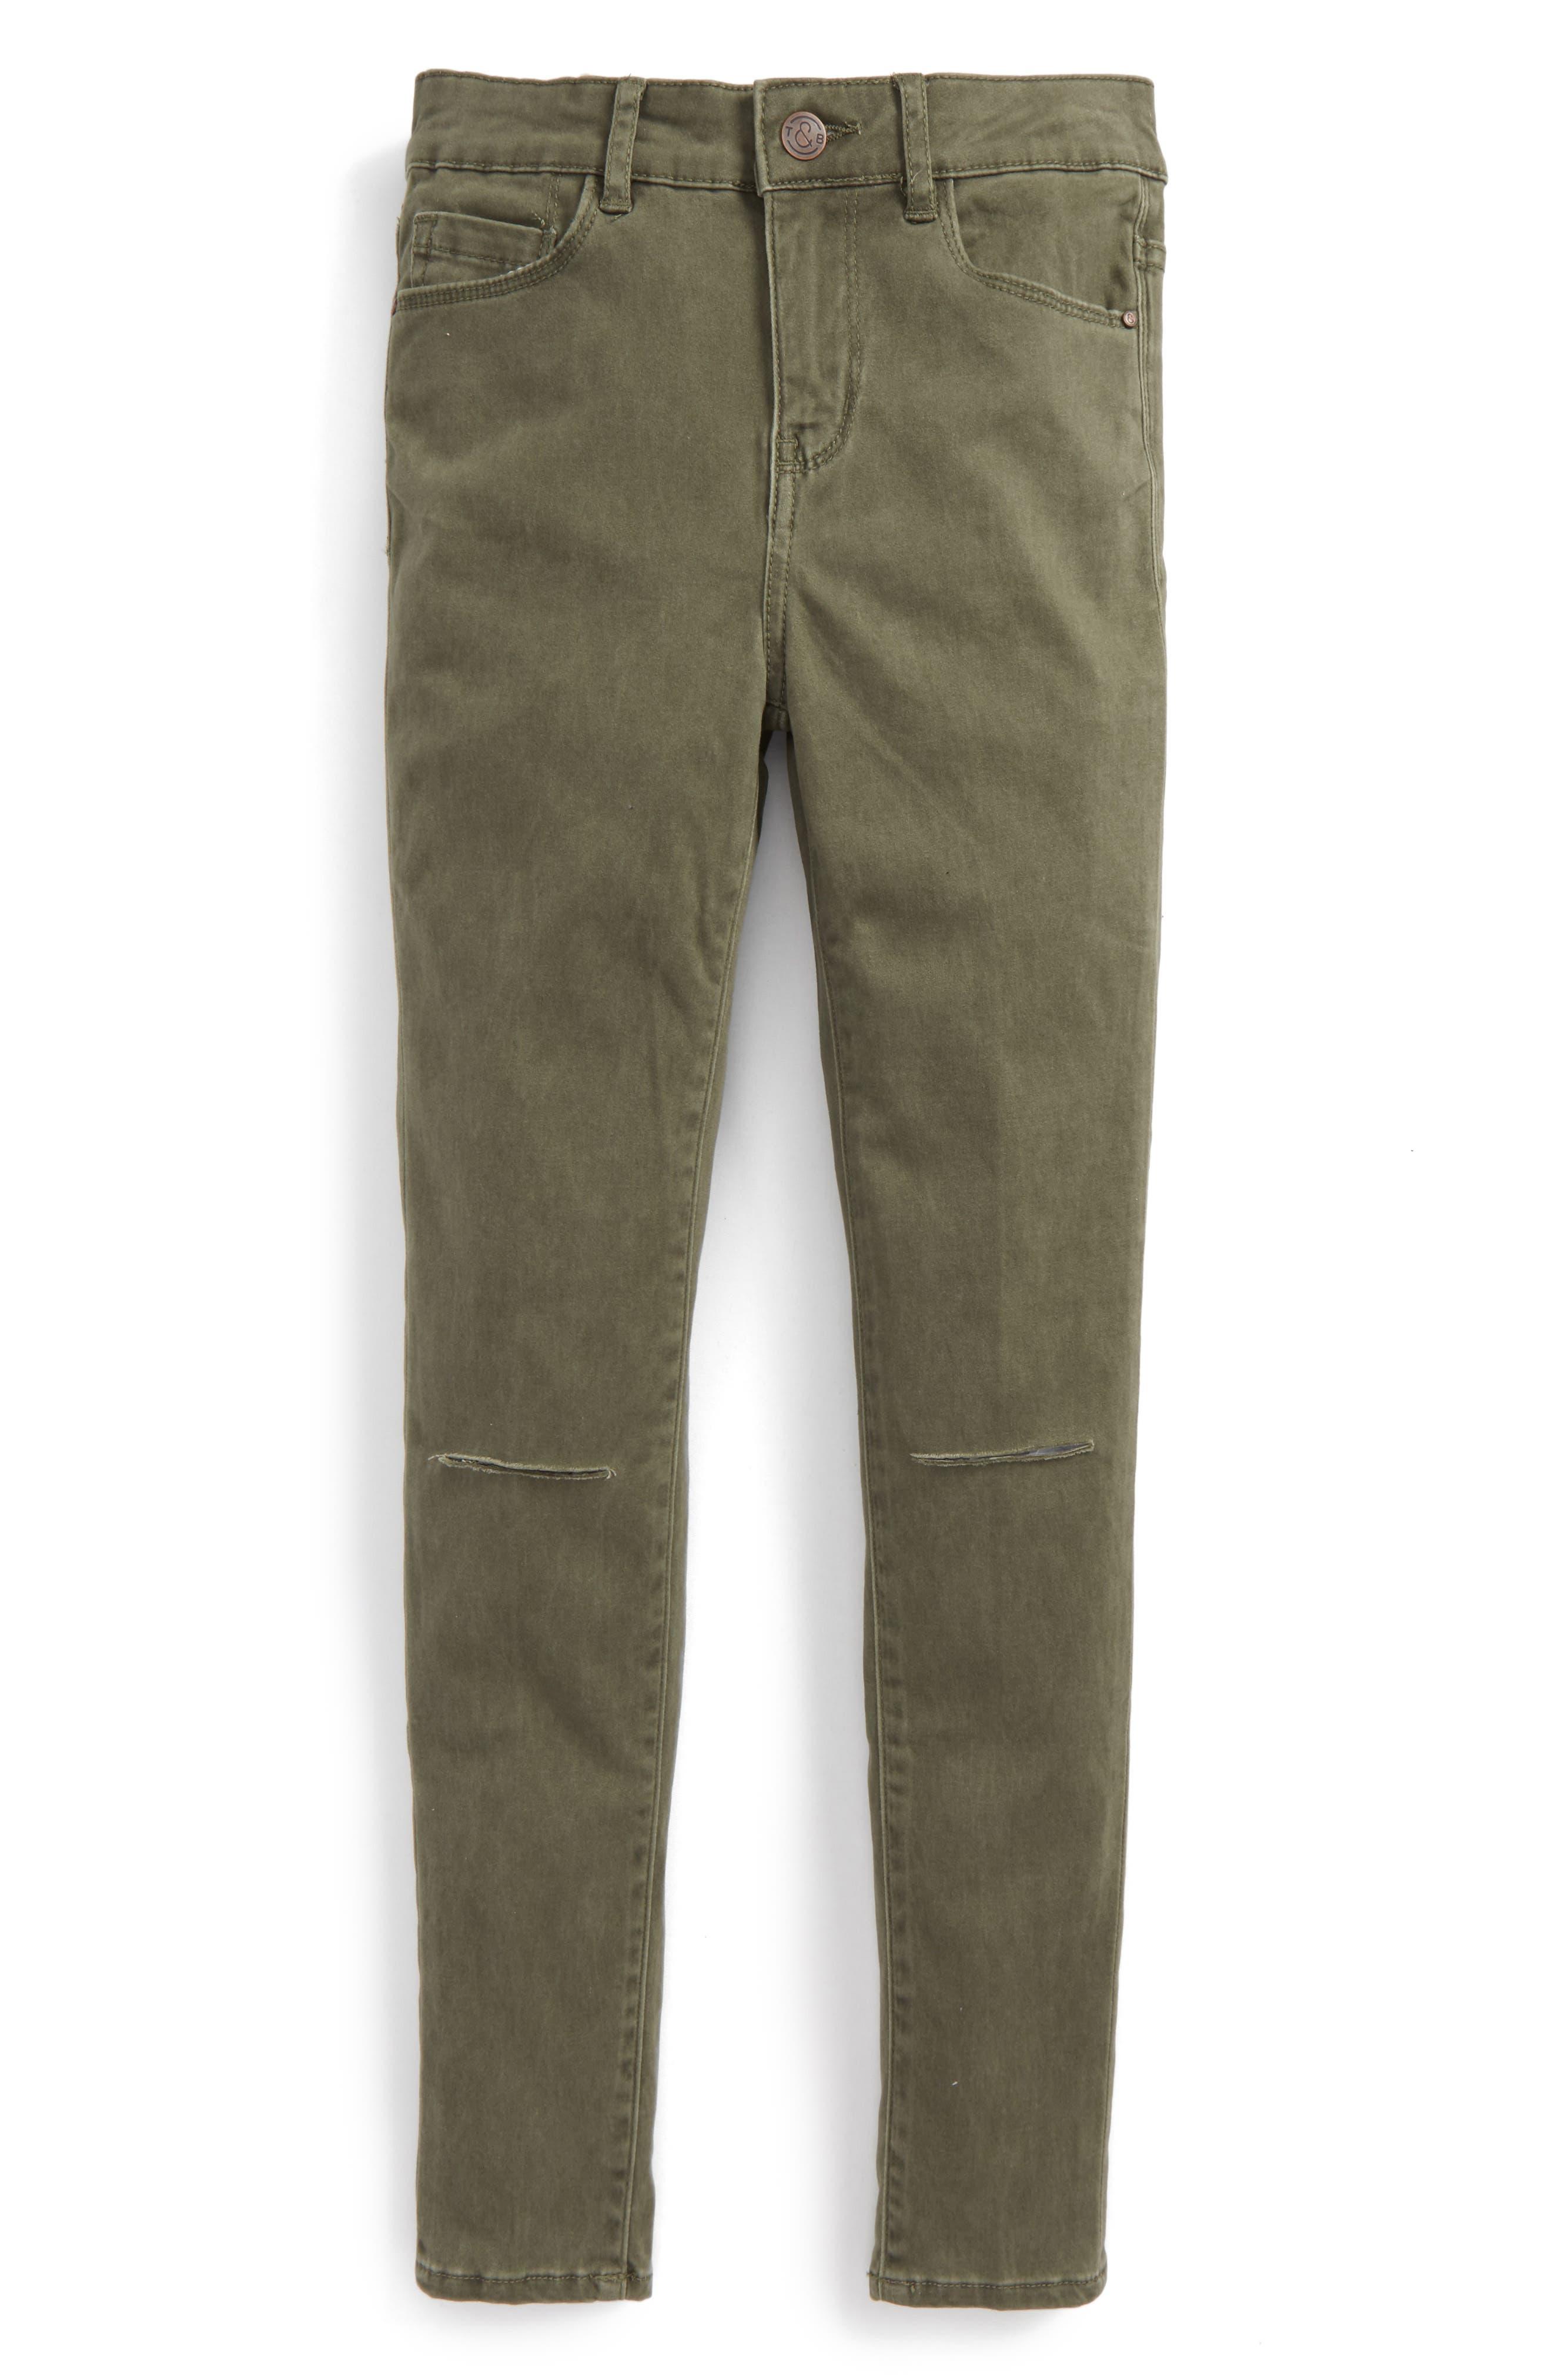 Main Image - Treasure & Bond Pigment Wash Skinny Jeans (Big Girls)